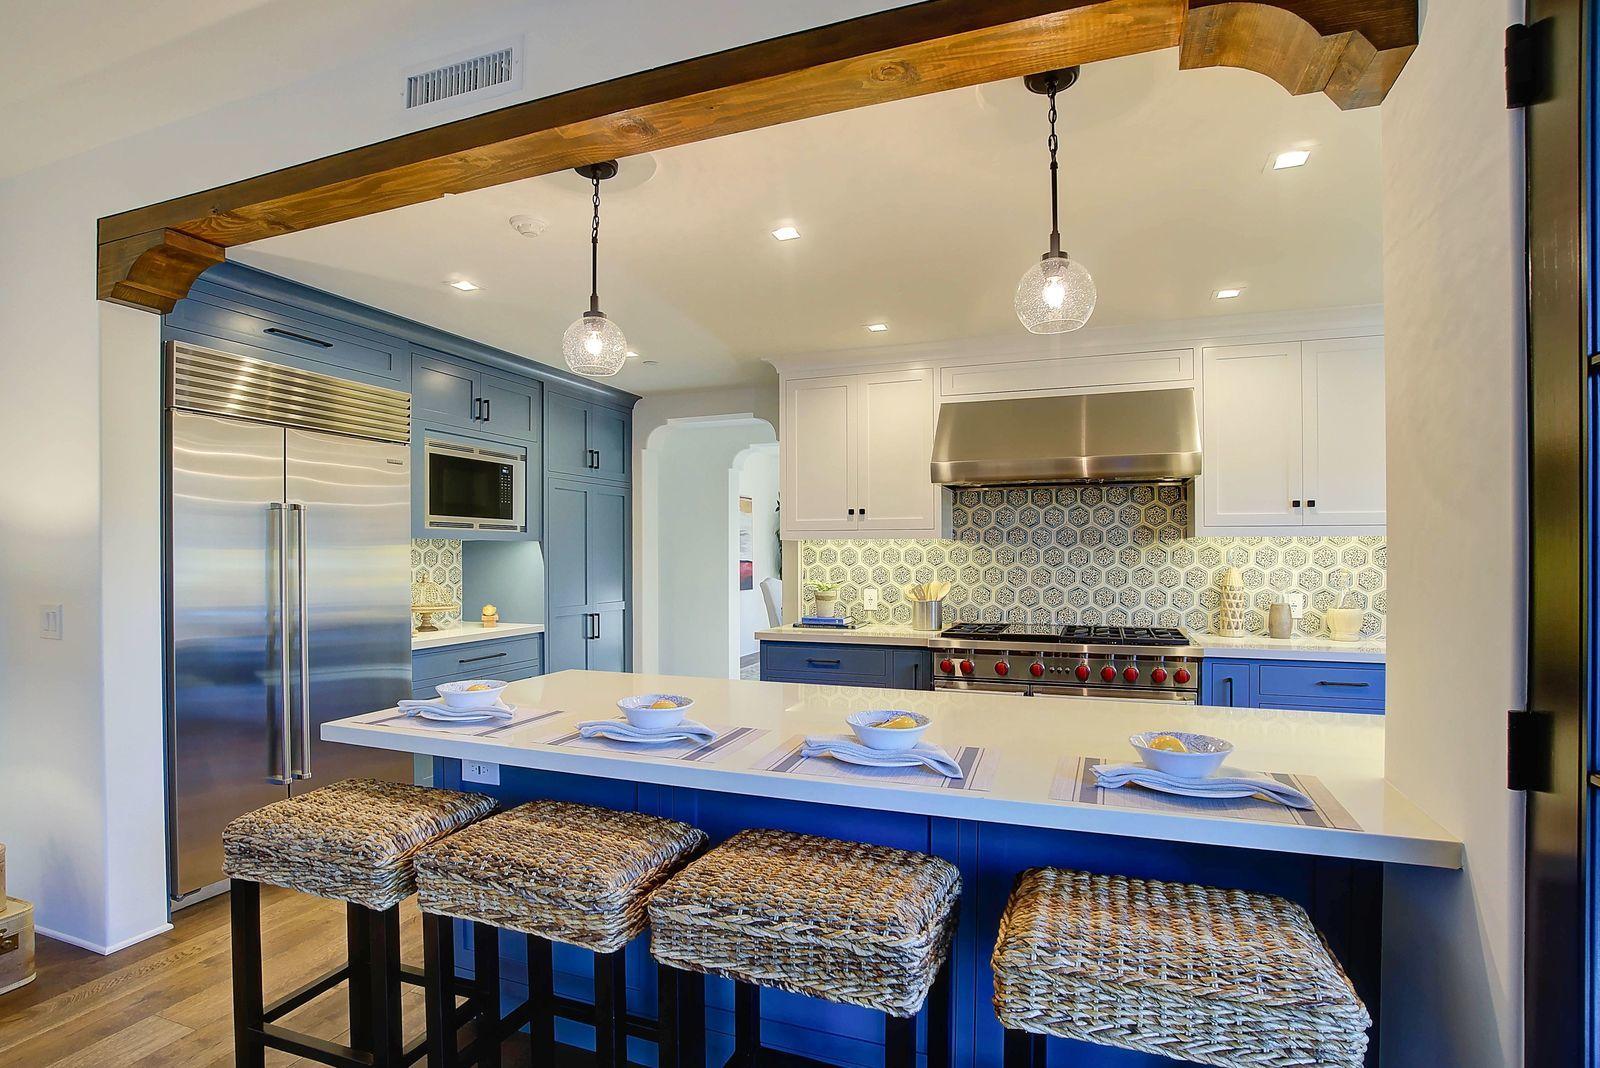 spanish-style-kitchen-blue-cabinets-premier-general-contractors.jpg